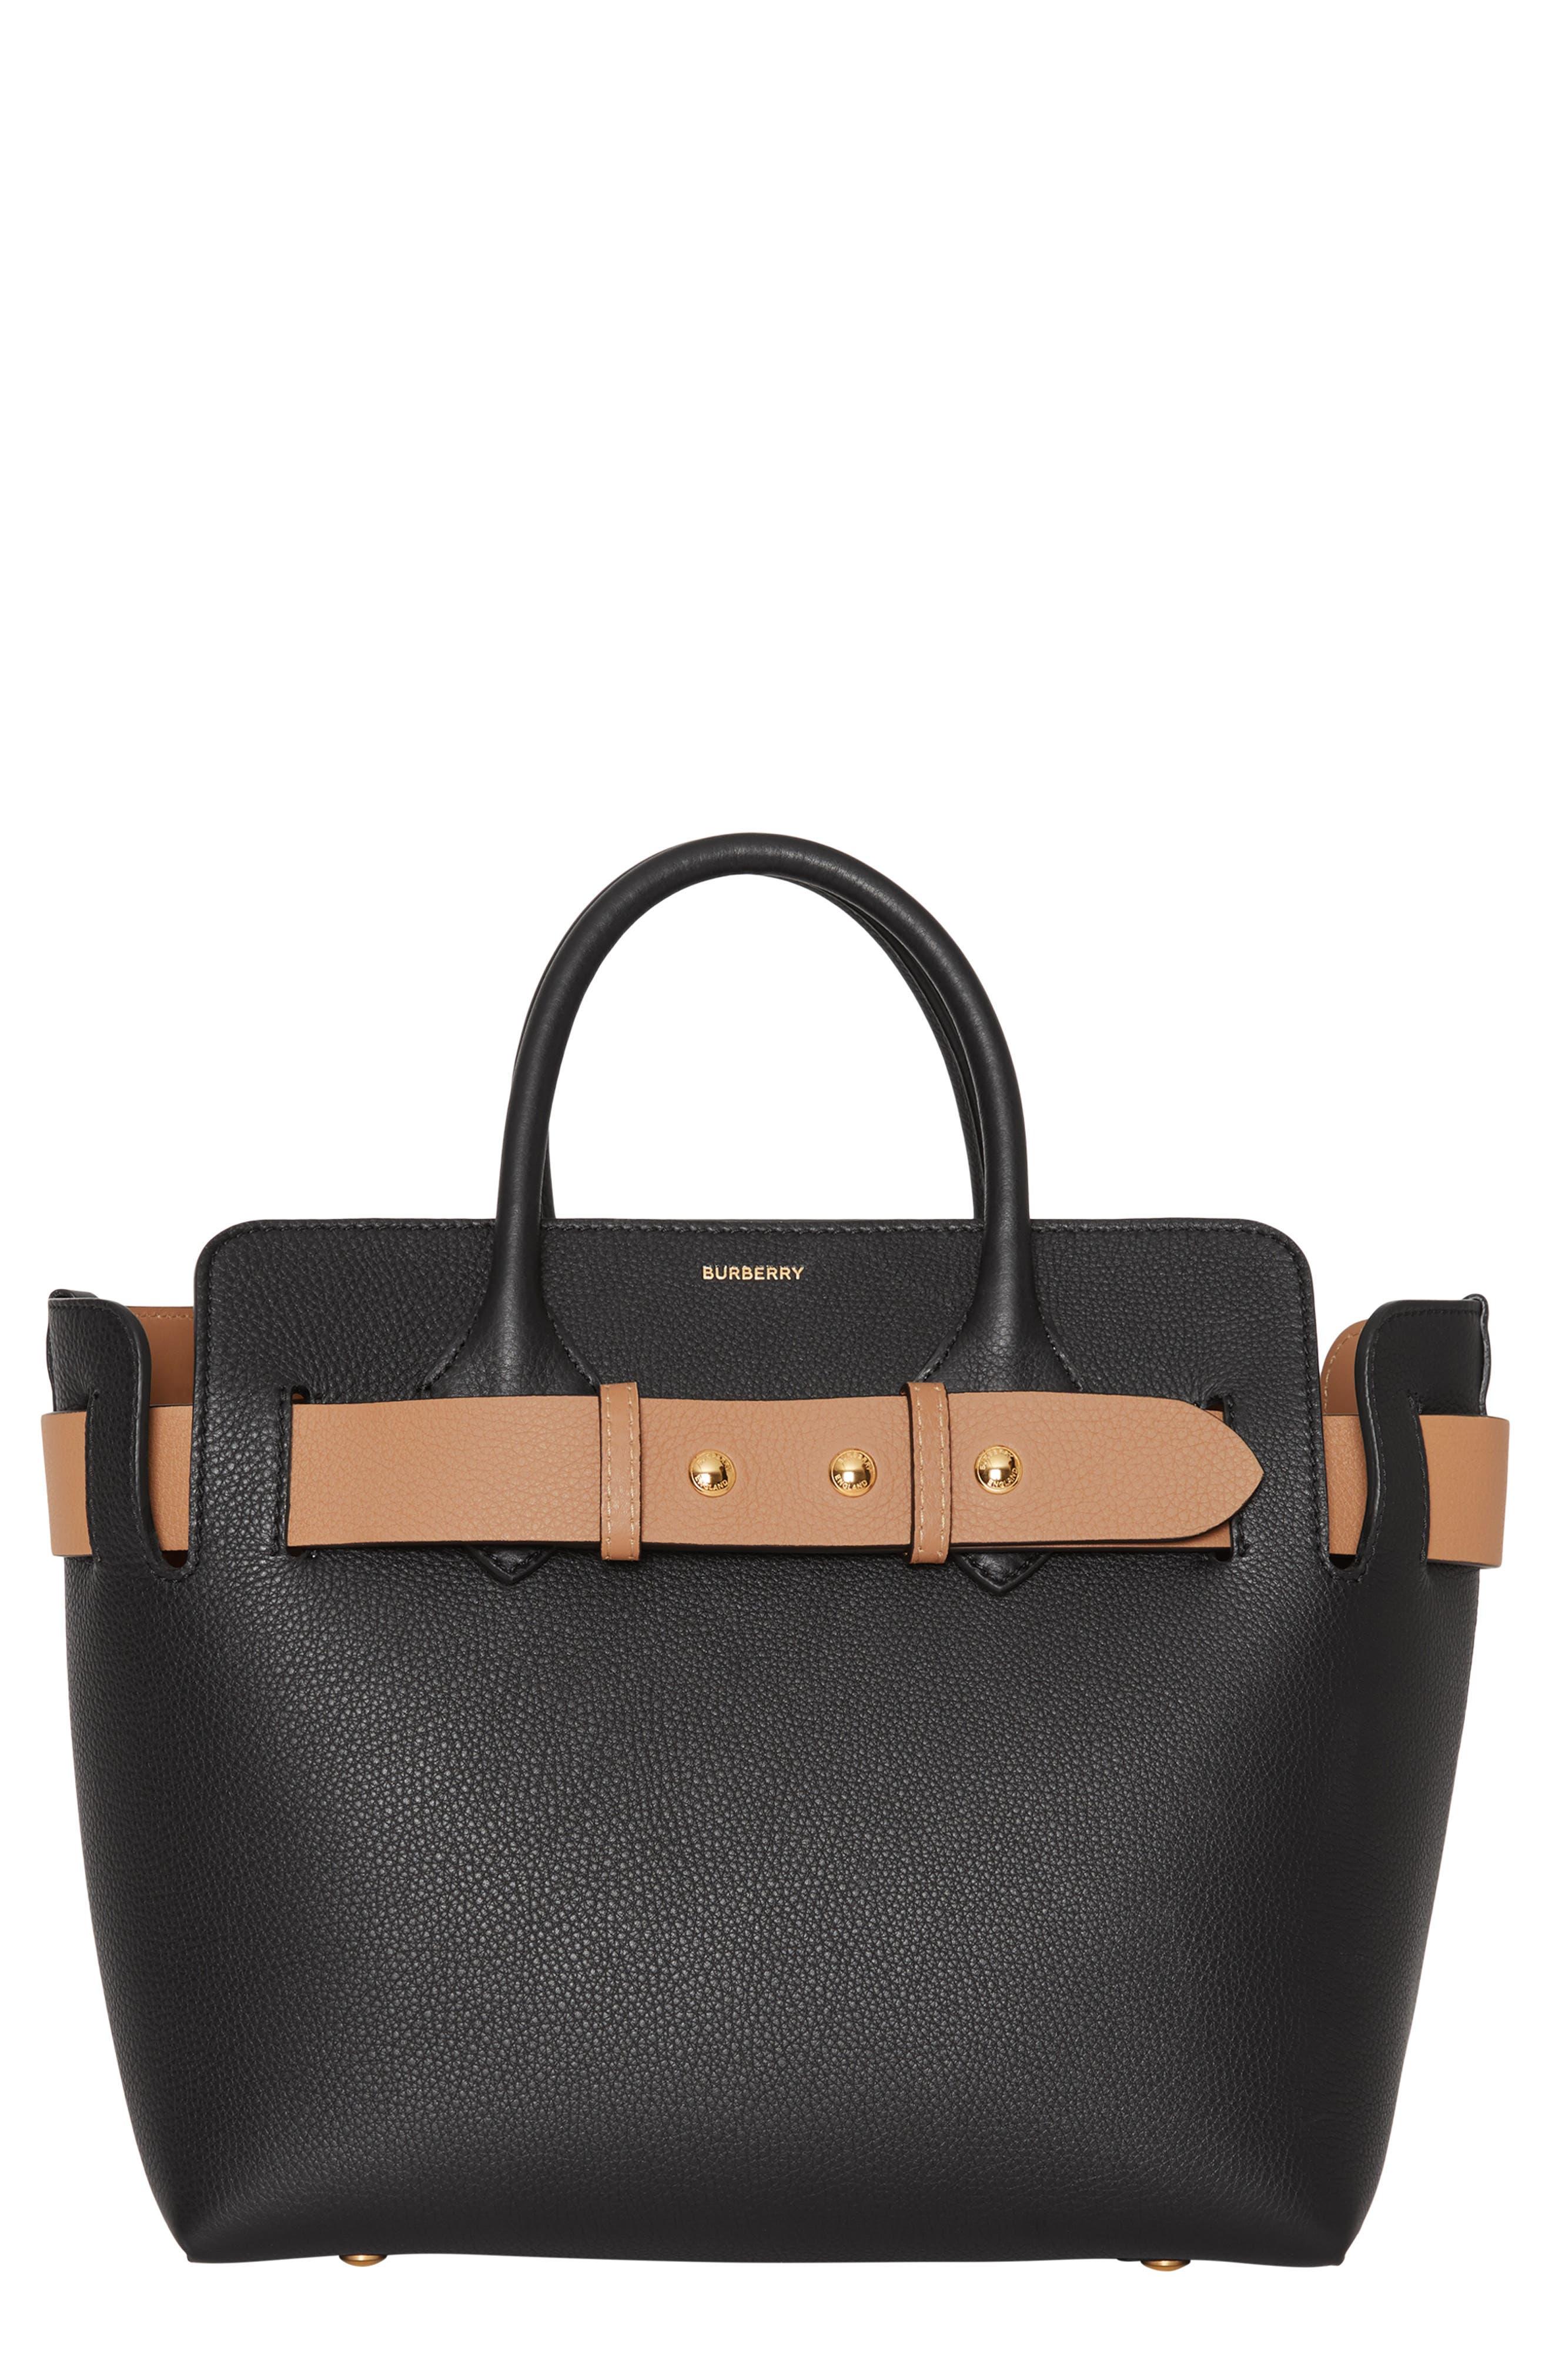 BURBERRY,                             Small Belt Leather Satchel,                             Main thumbnail 1, color,                             BLACK